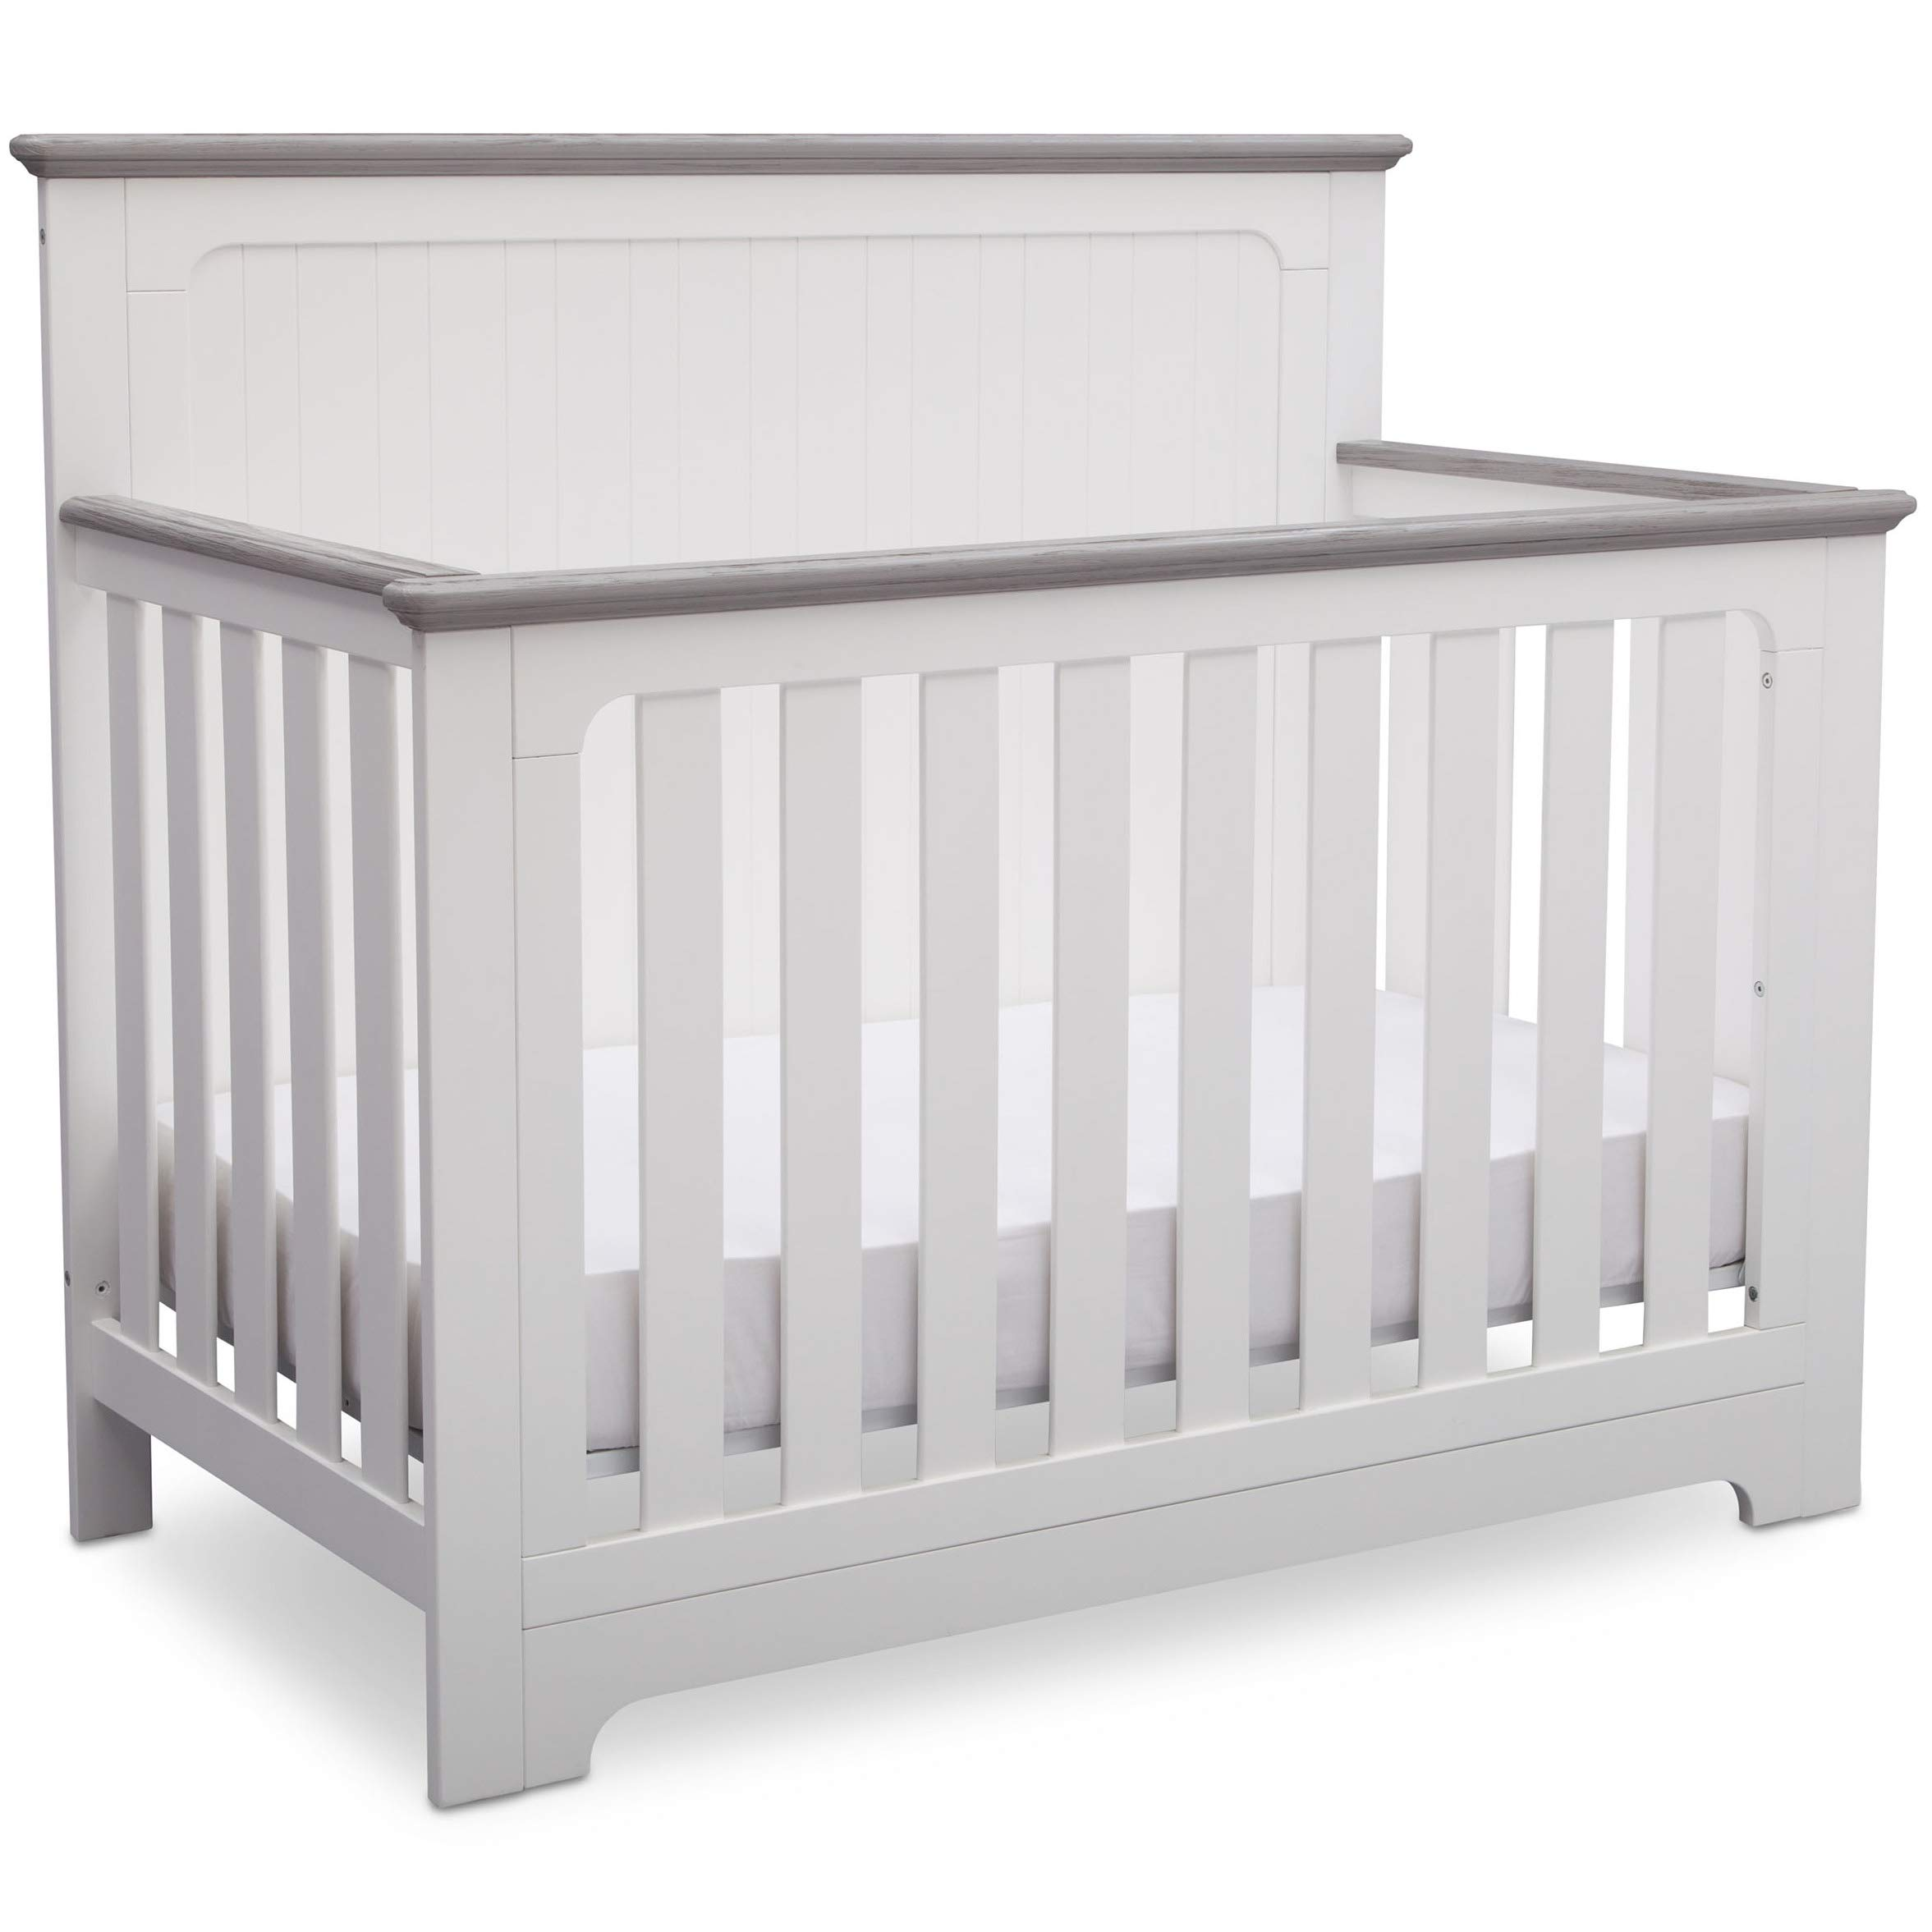 Delta Children Providence 4-in-1 Convertible Baby Crib, Bianca White with Rustic Haze by Delta Children